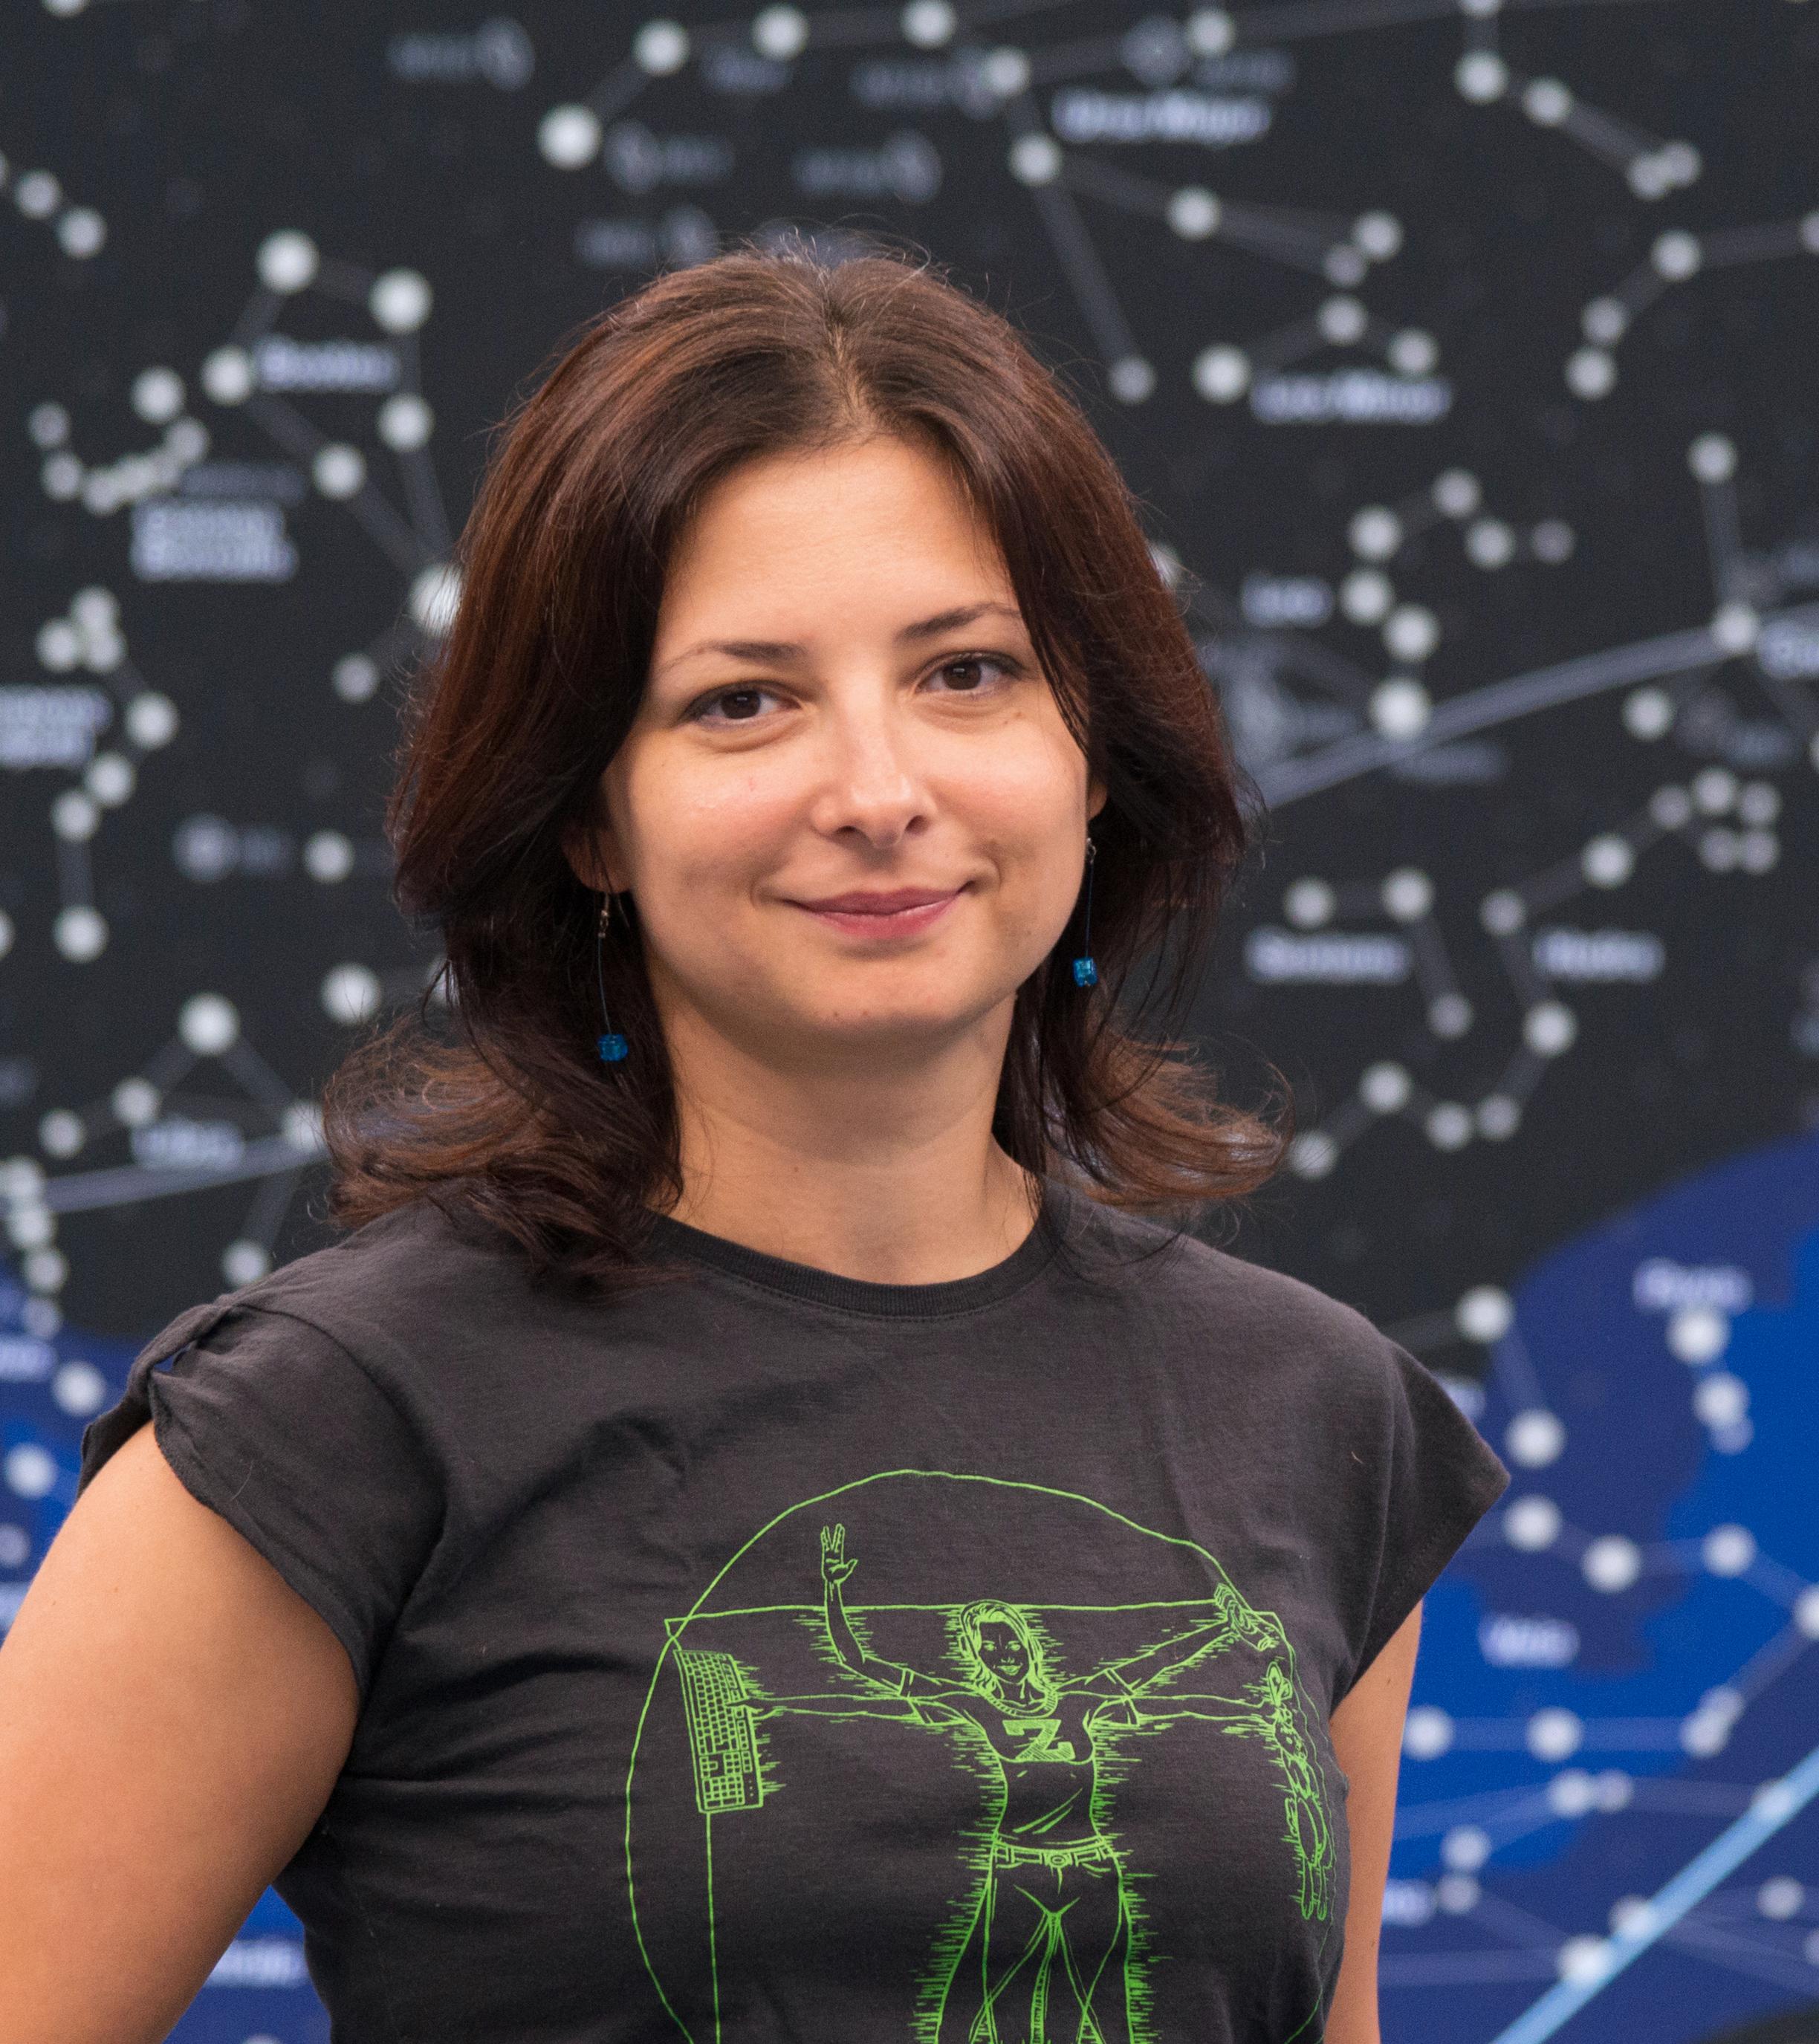 Simona Lapusan